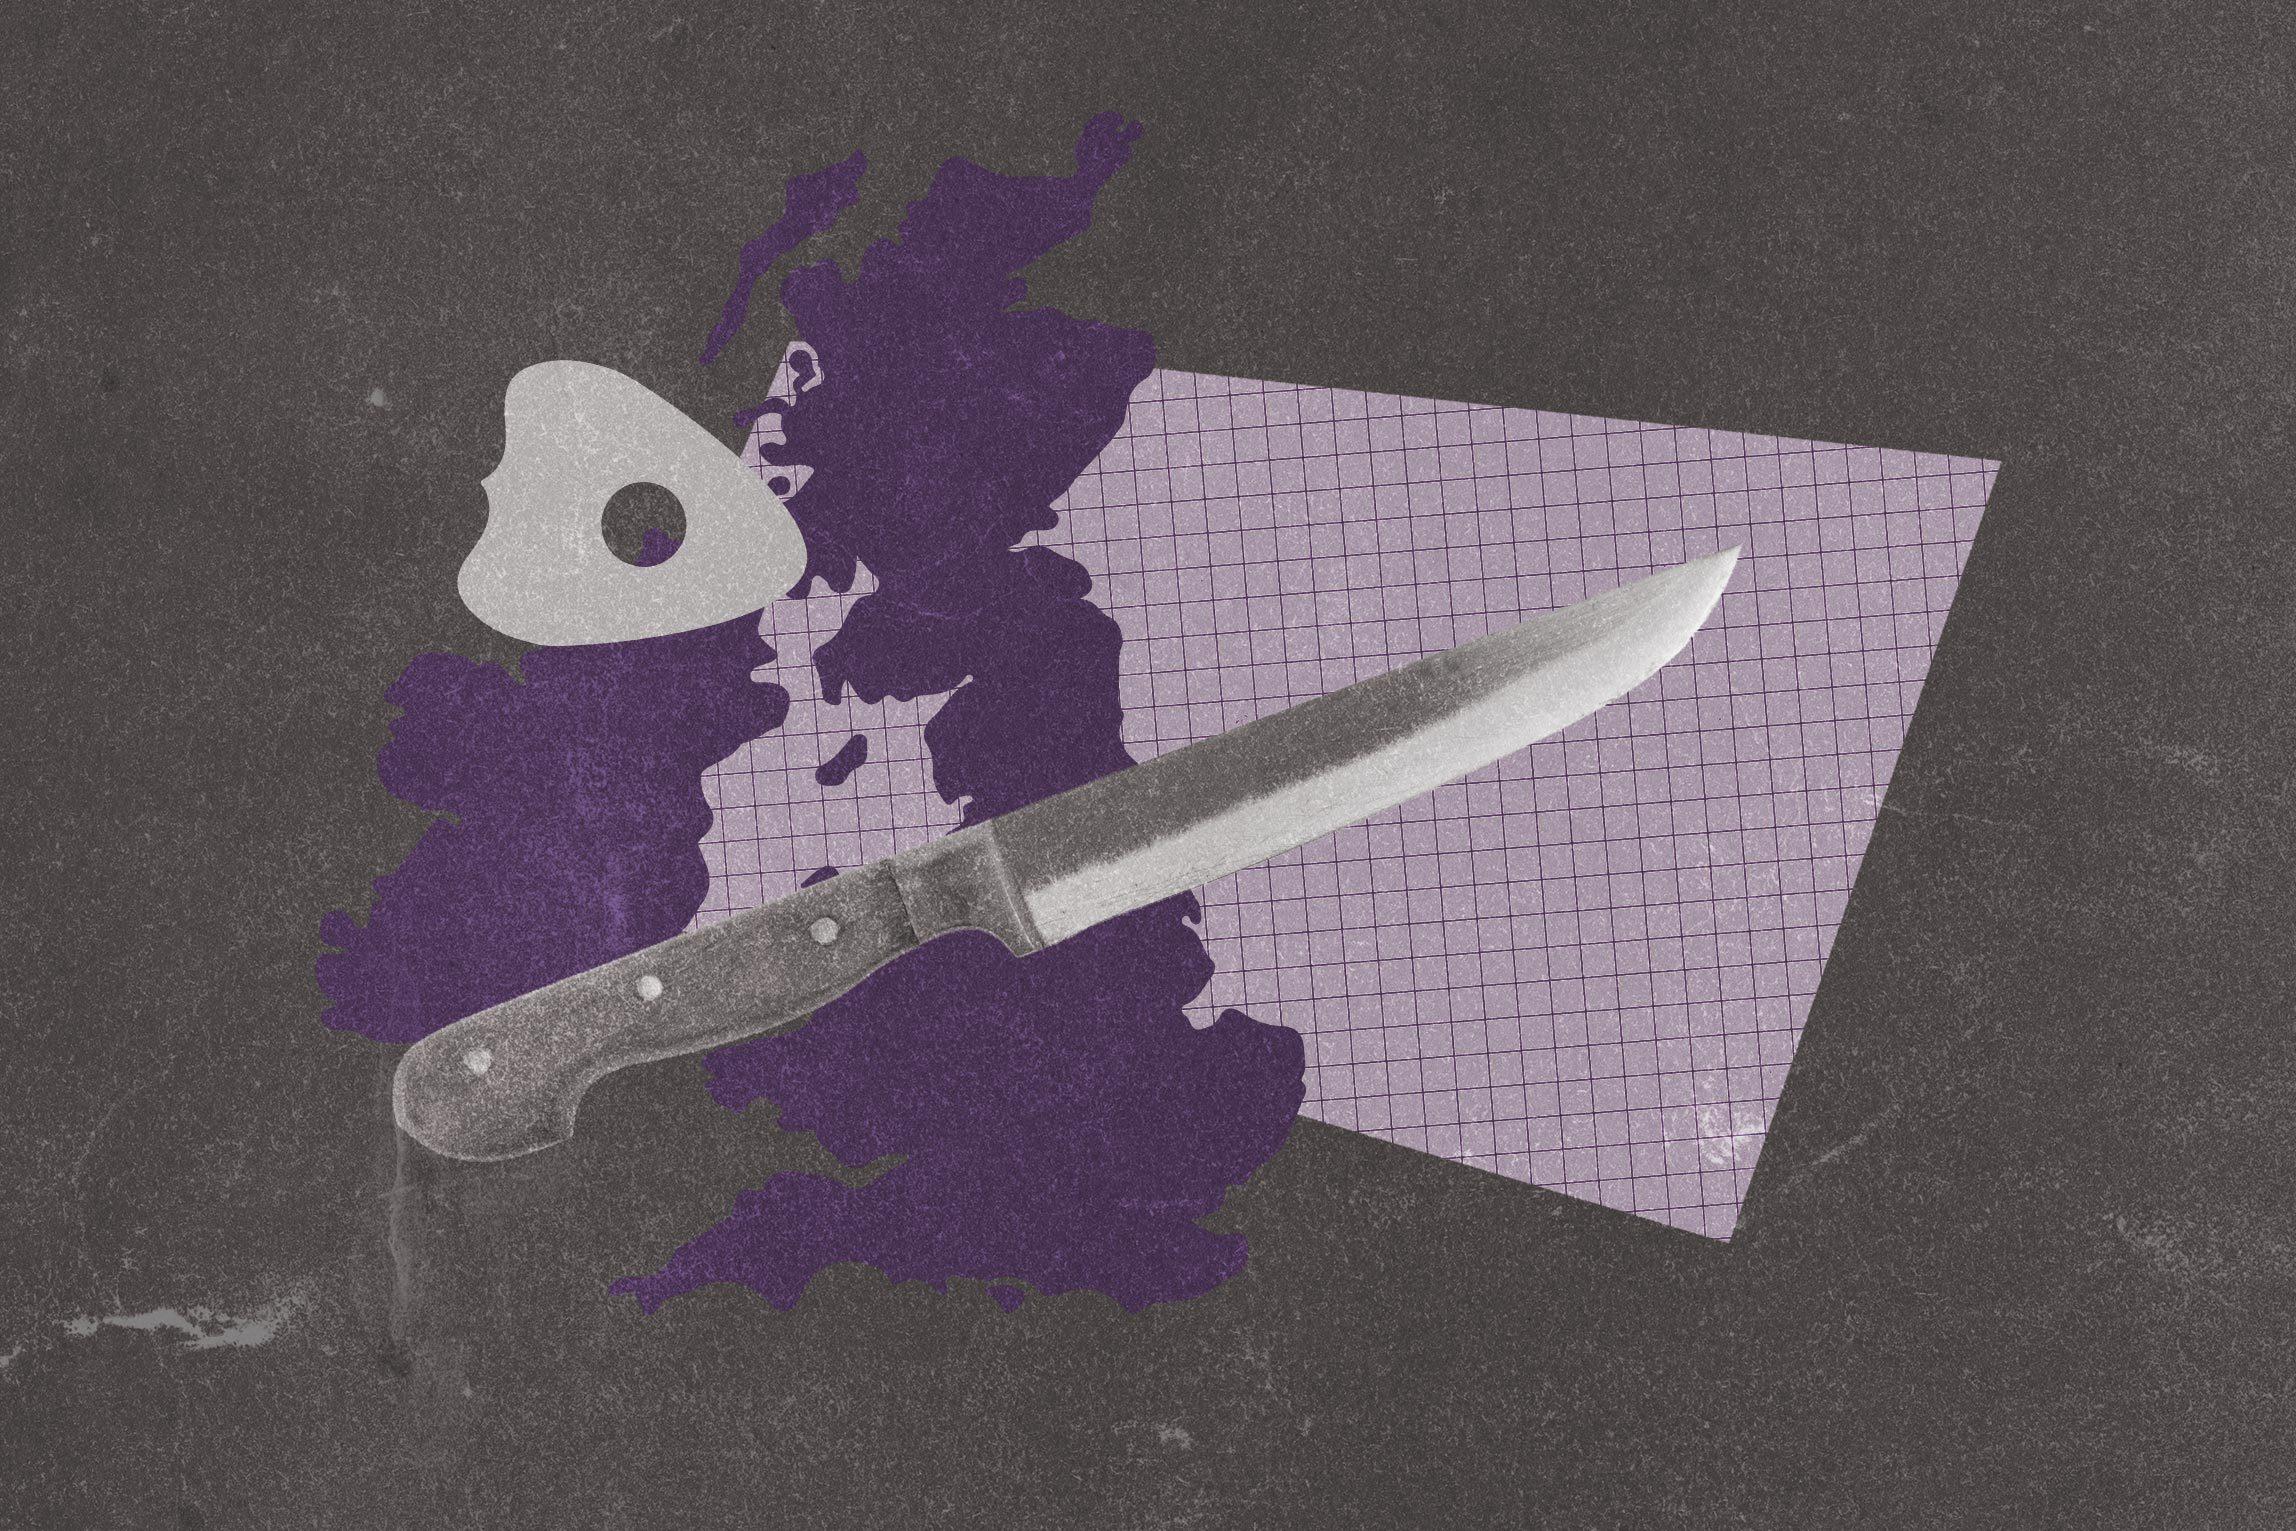 Collage of knife, outline of United Kingdom